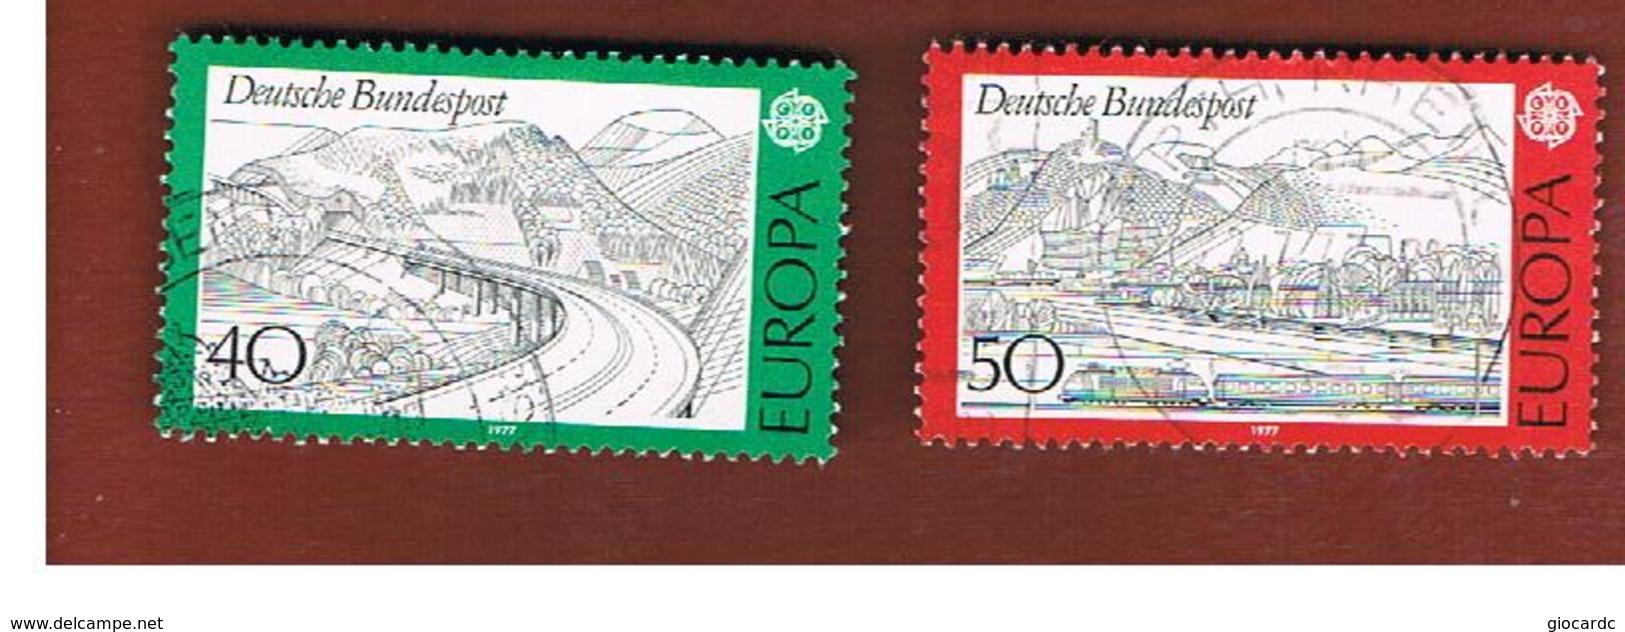 GERMANIA (GERMANY)  - 1977 EUROPA  - USED - Europa-CEPT